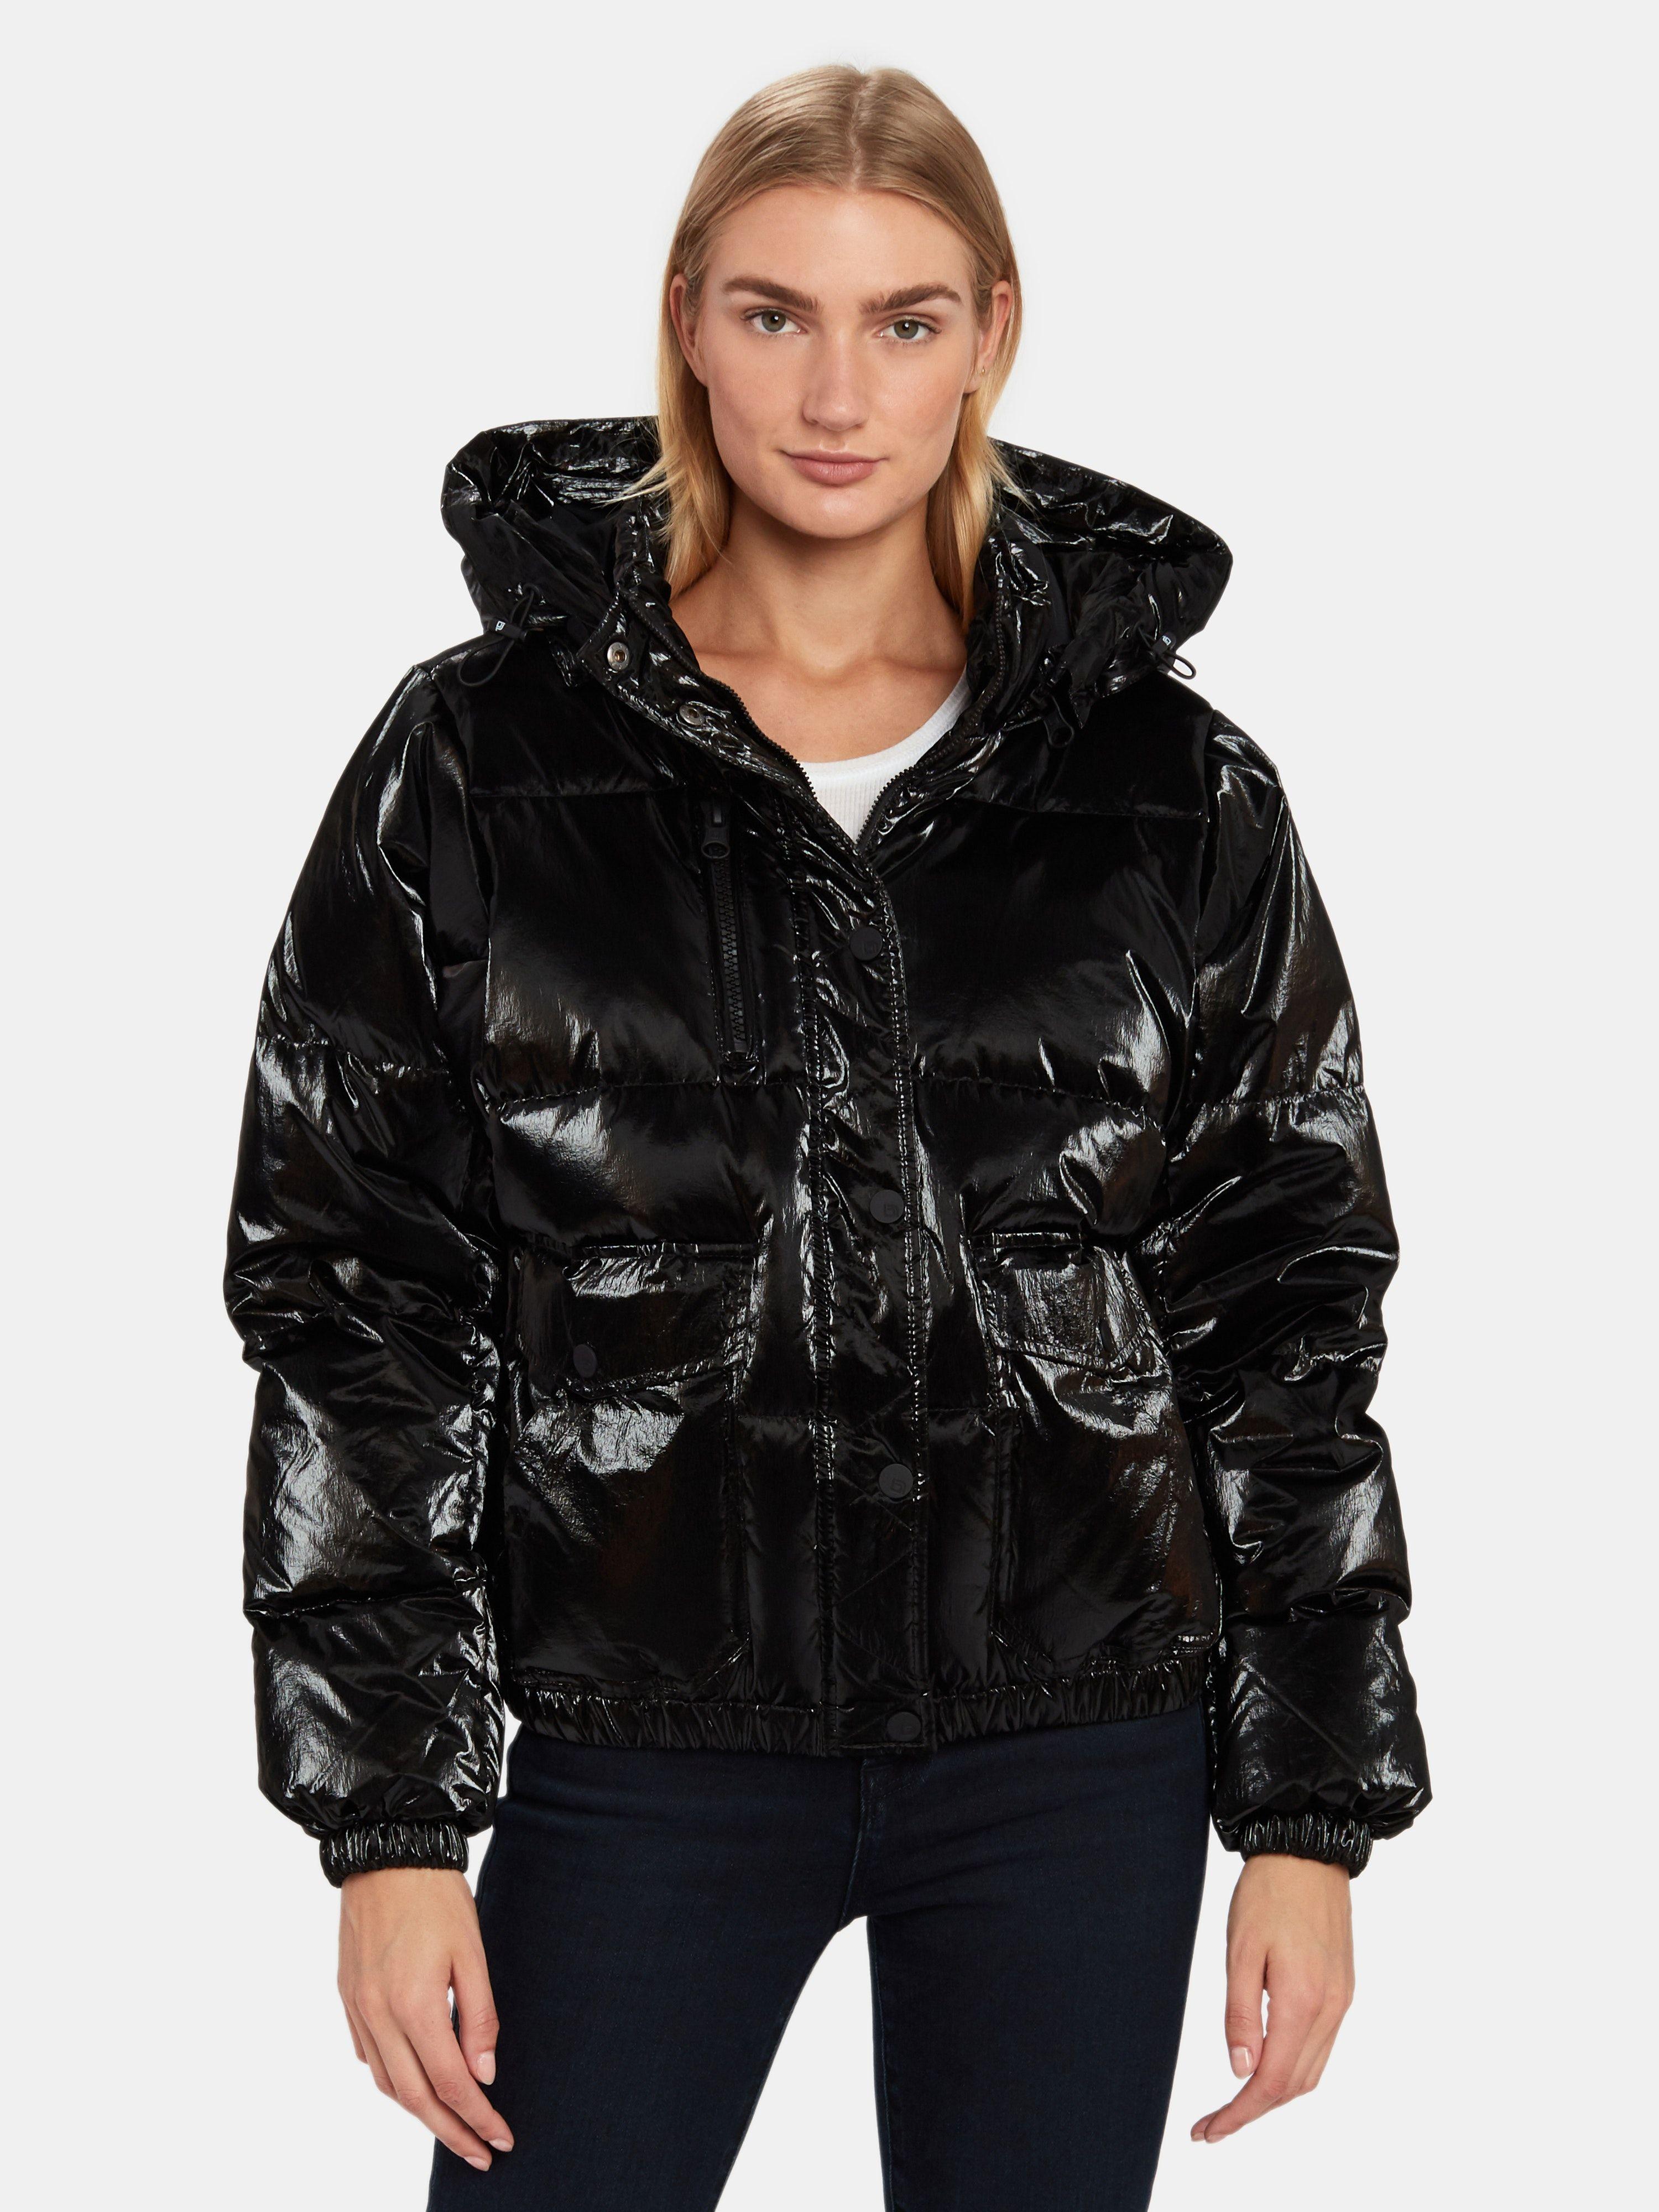 Blanc Noir Mont Blanc Reflective Trim Puffer Jacket Puffer Jackets Puffer Puffer Jacket Black [ 4000 x 3000 Pixel ]